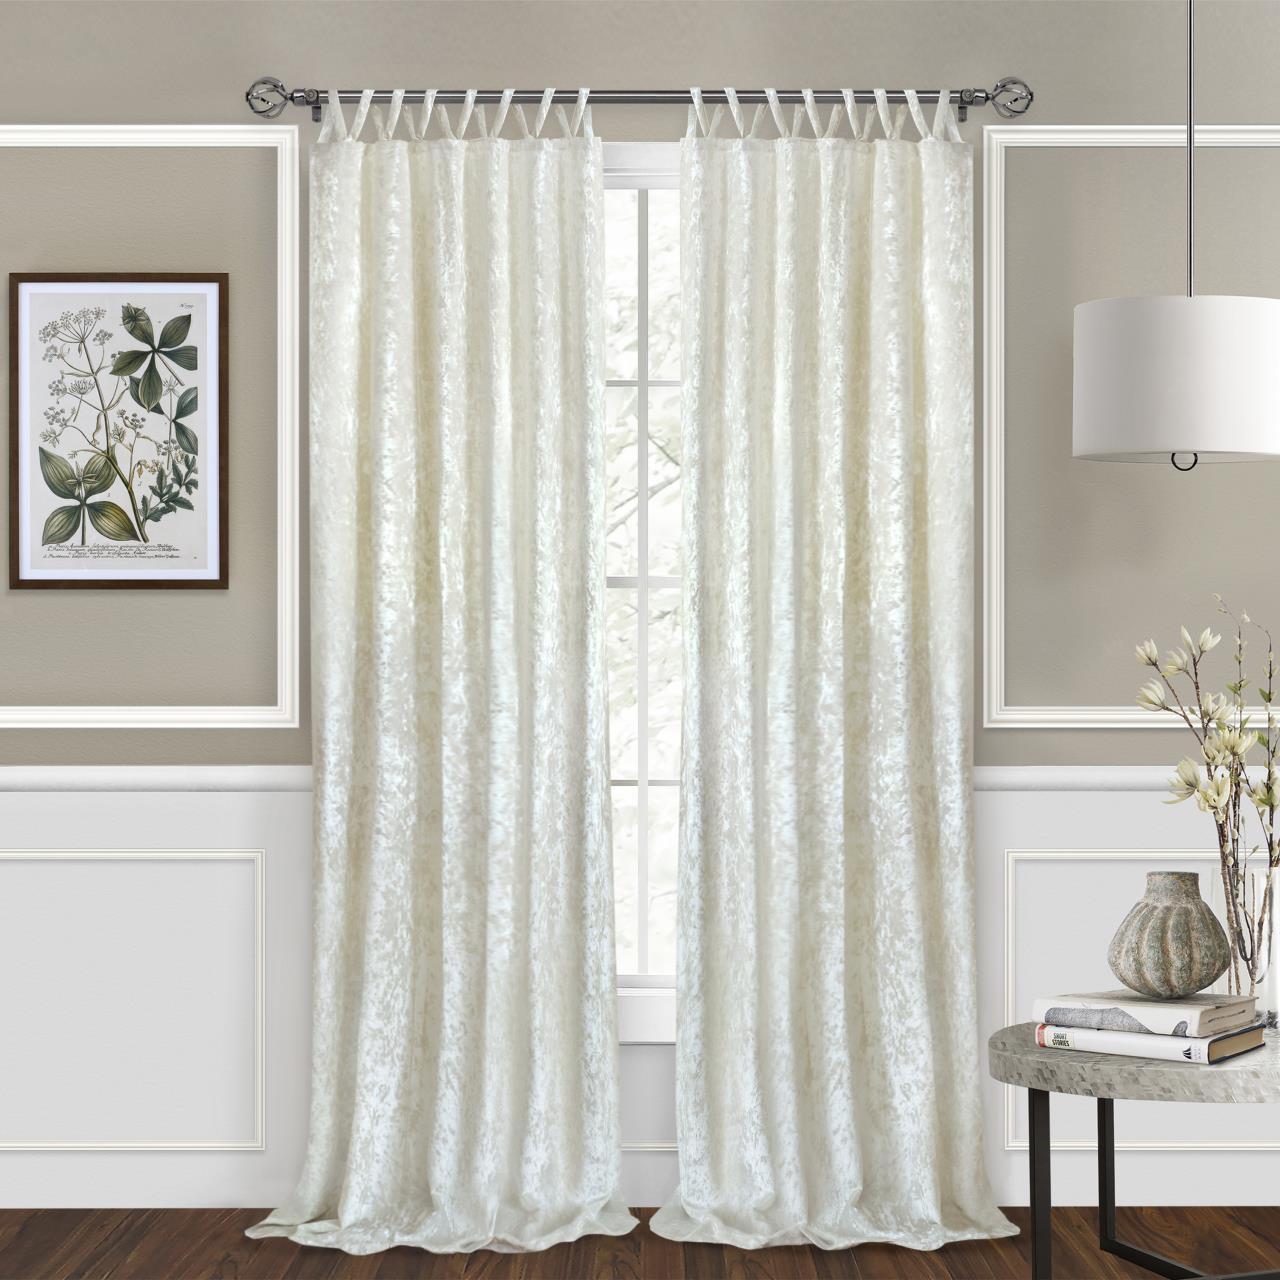 Harper Criss-Cross Curtain - 054006254905